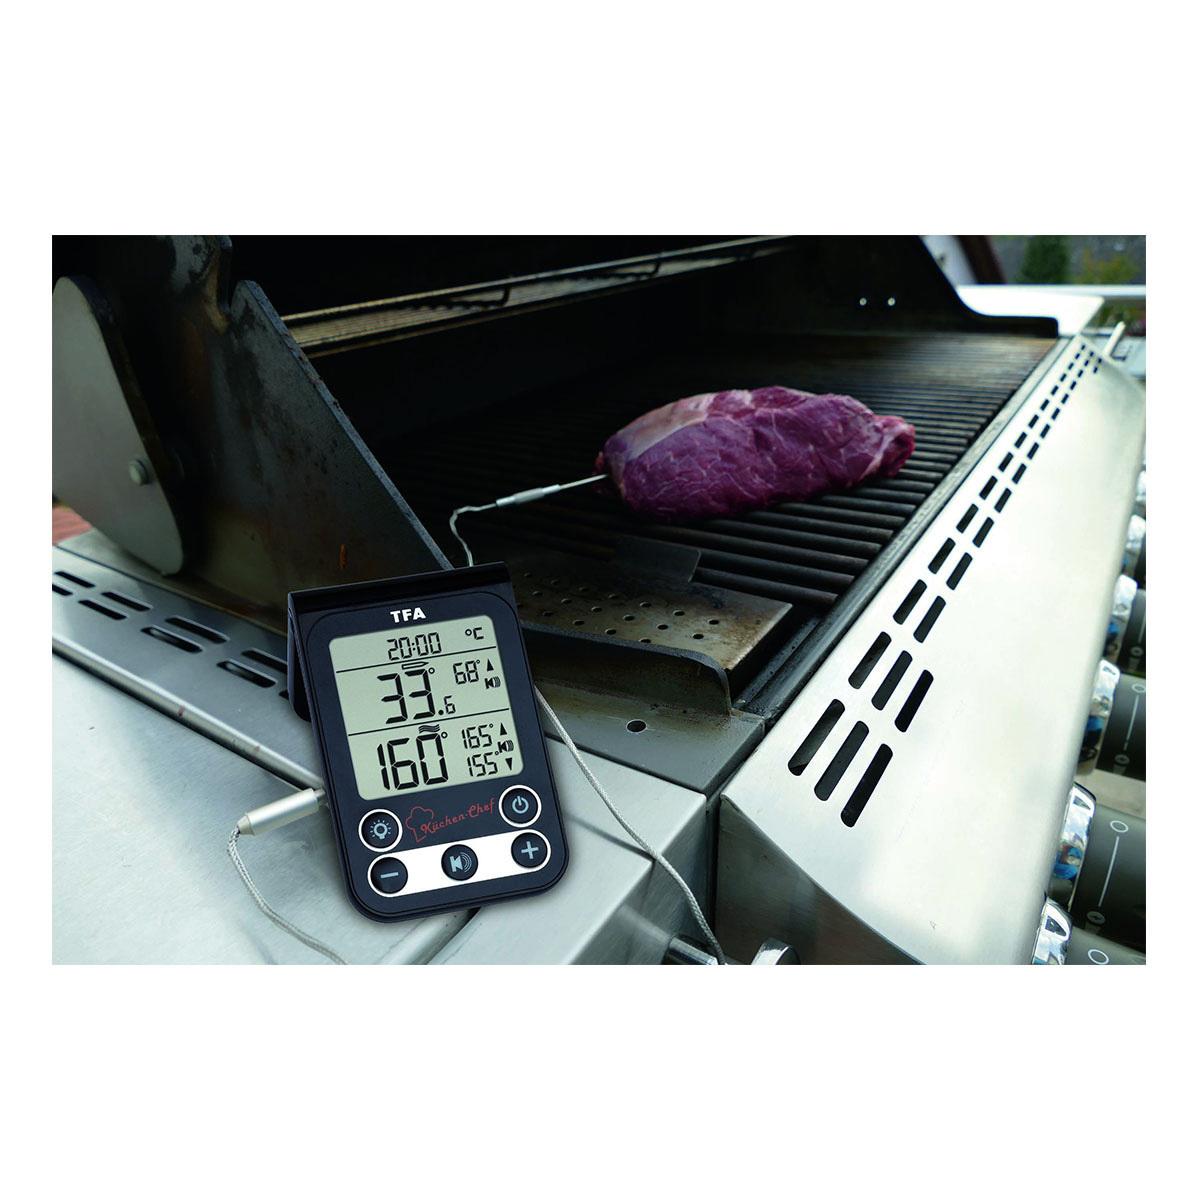 "Кухонный термометр для духовки и гриля TFA ""KÜCHEN-CHEF"" (14151201)"